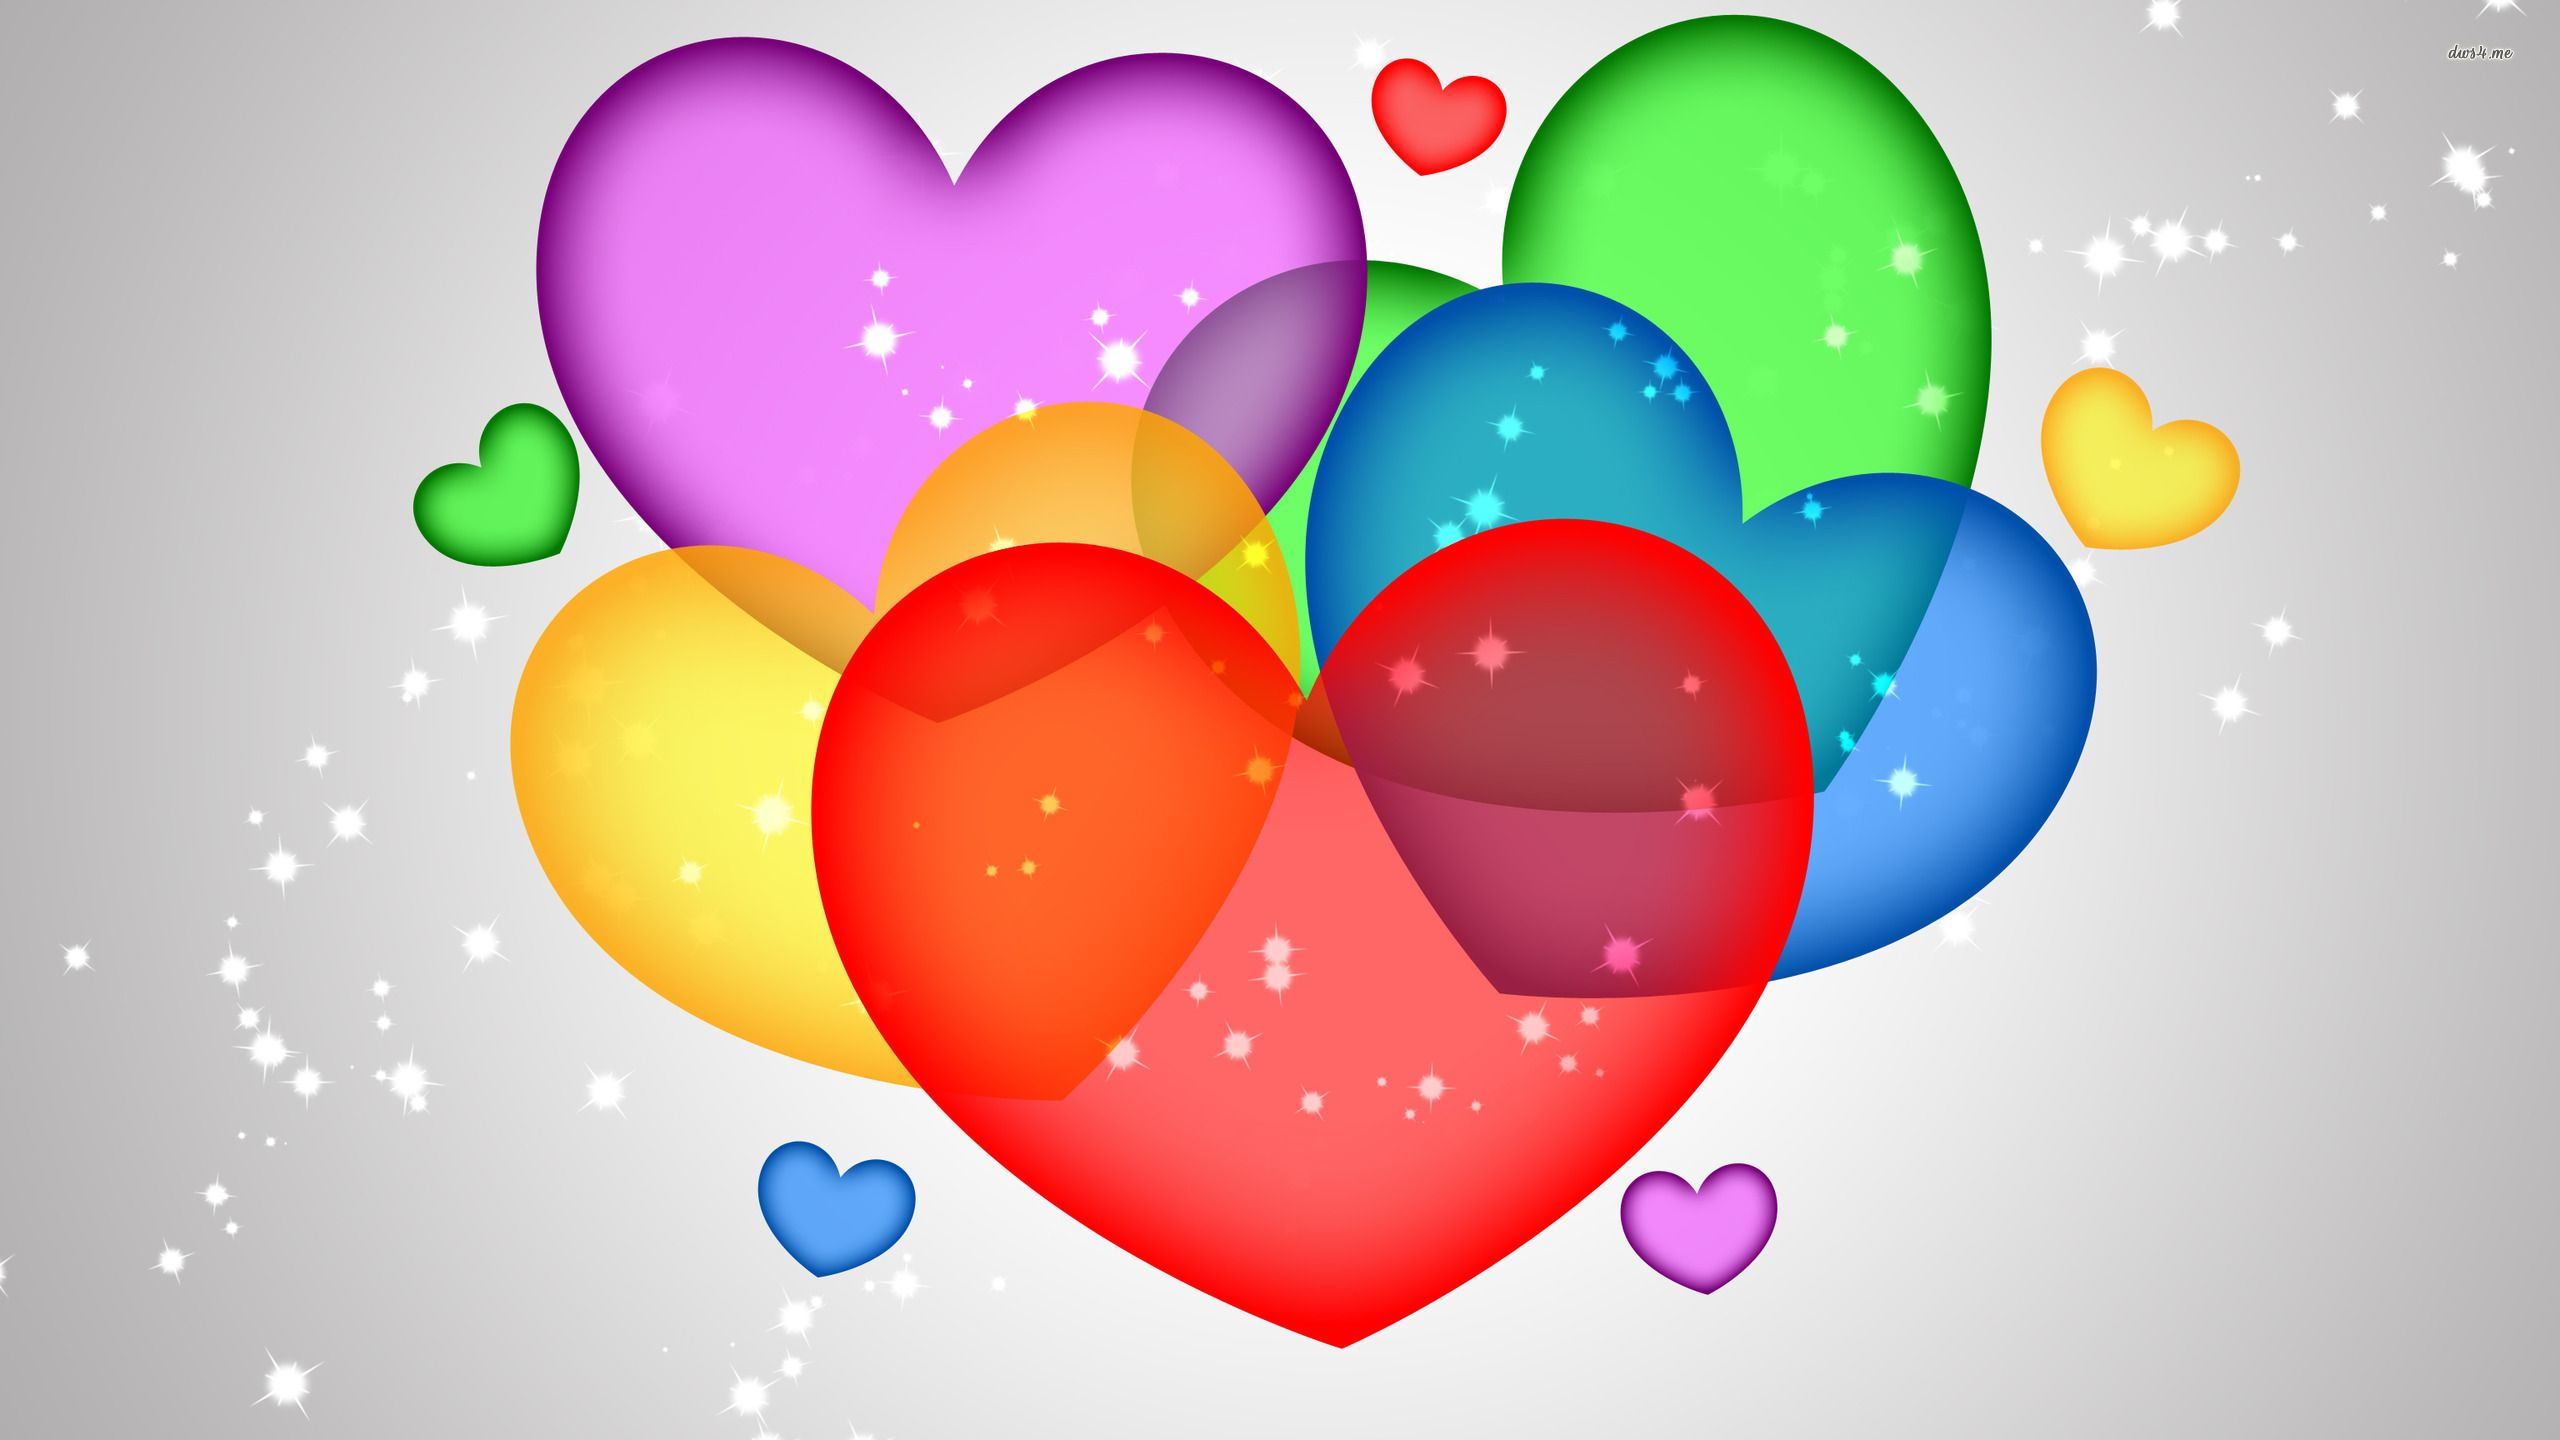 Fondo De Fondos De Corazon Heart Wallpaper Cute Love Wallpapers